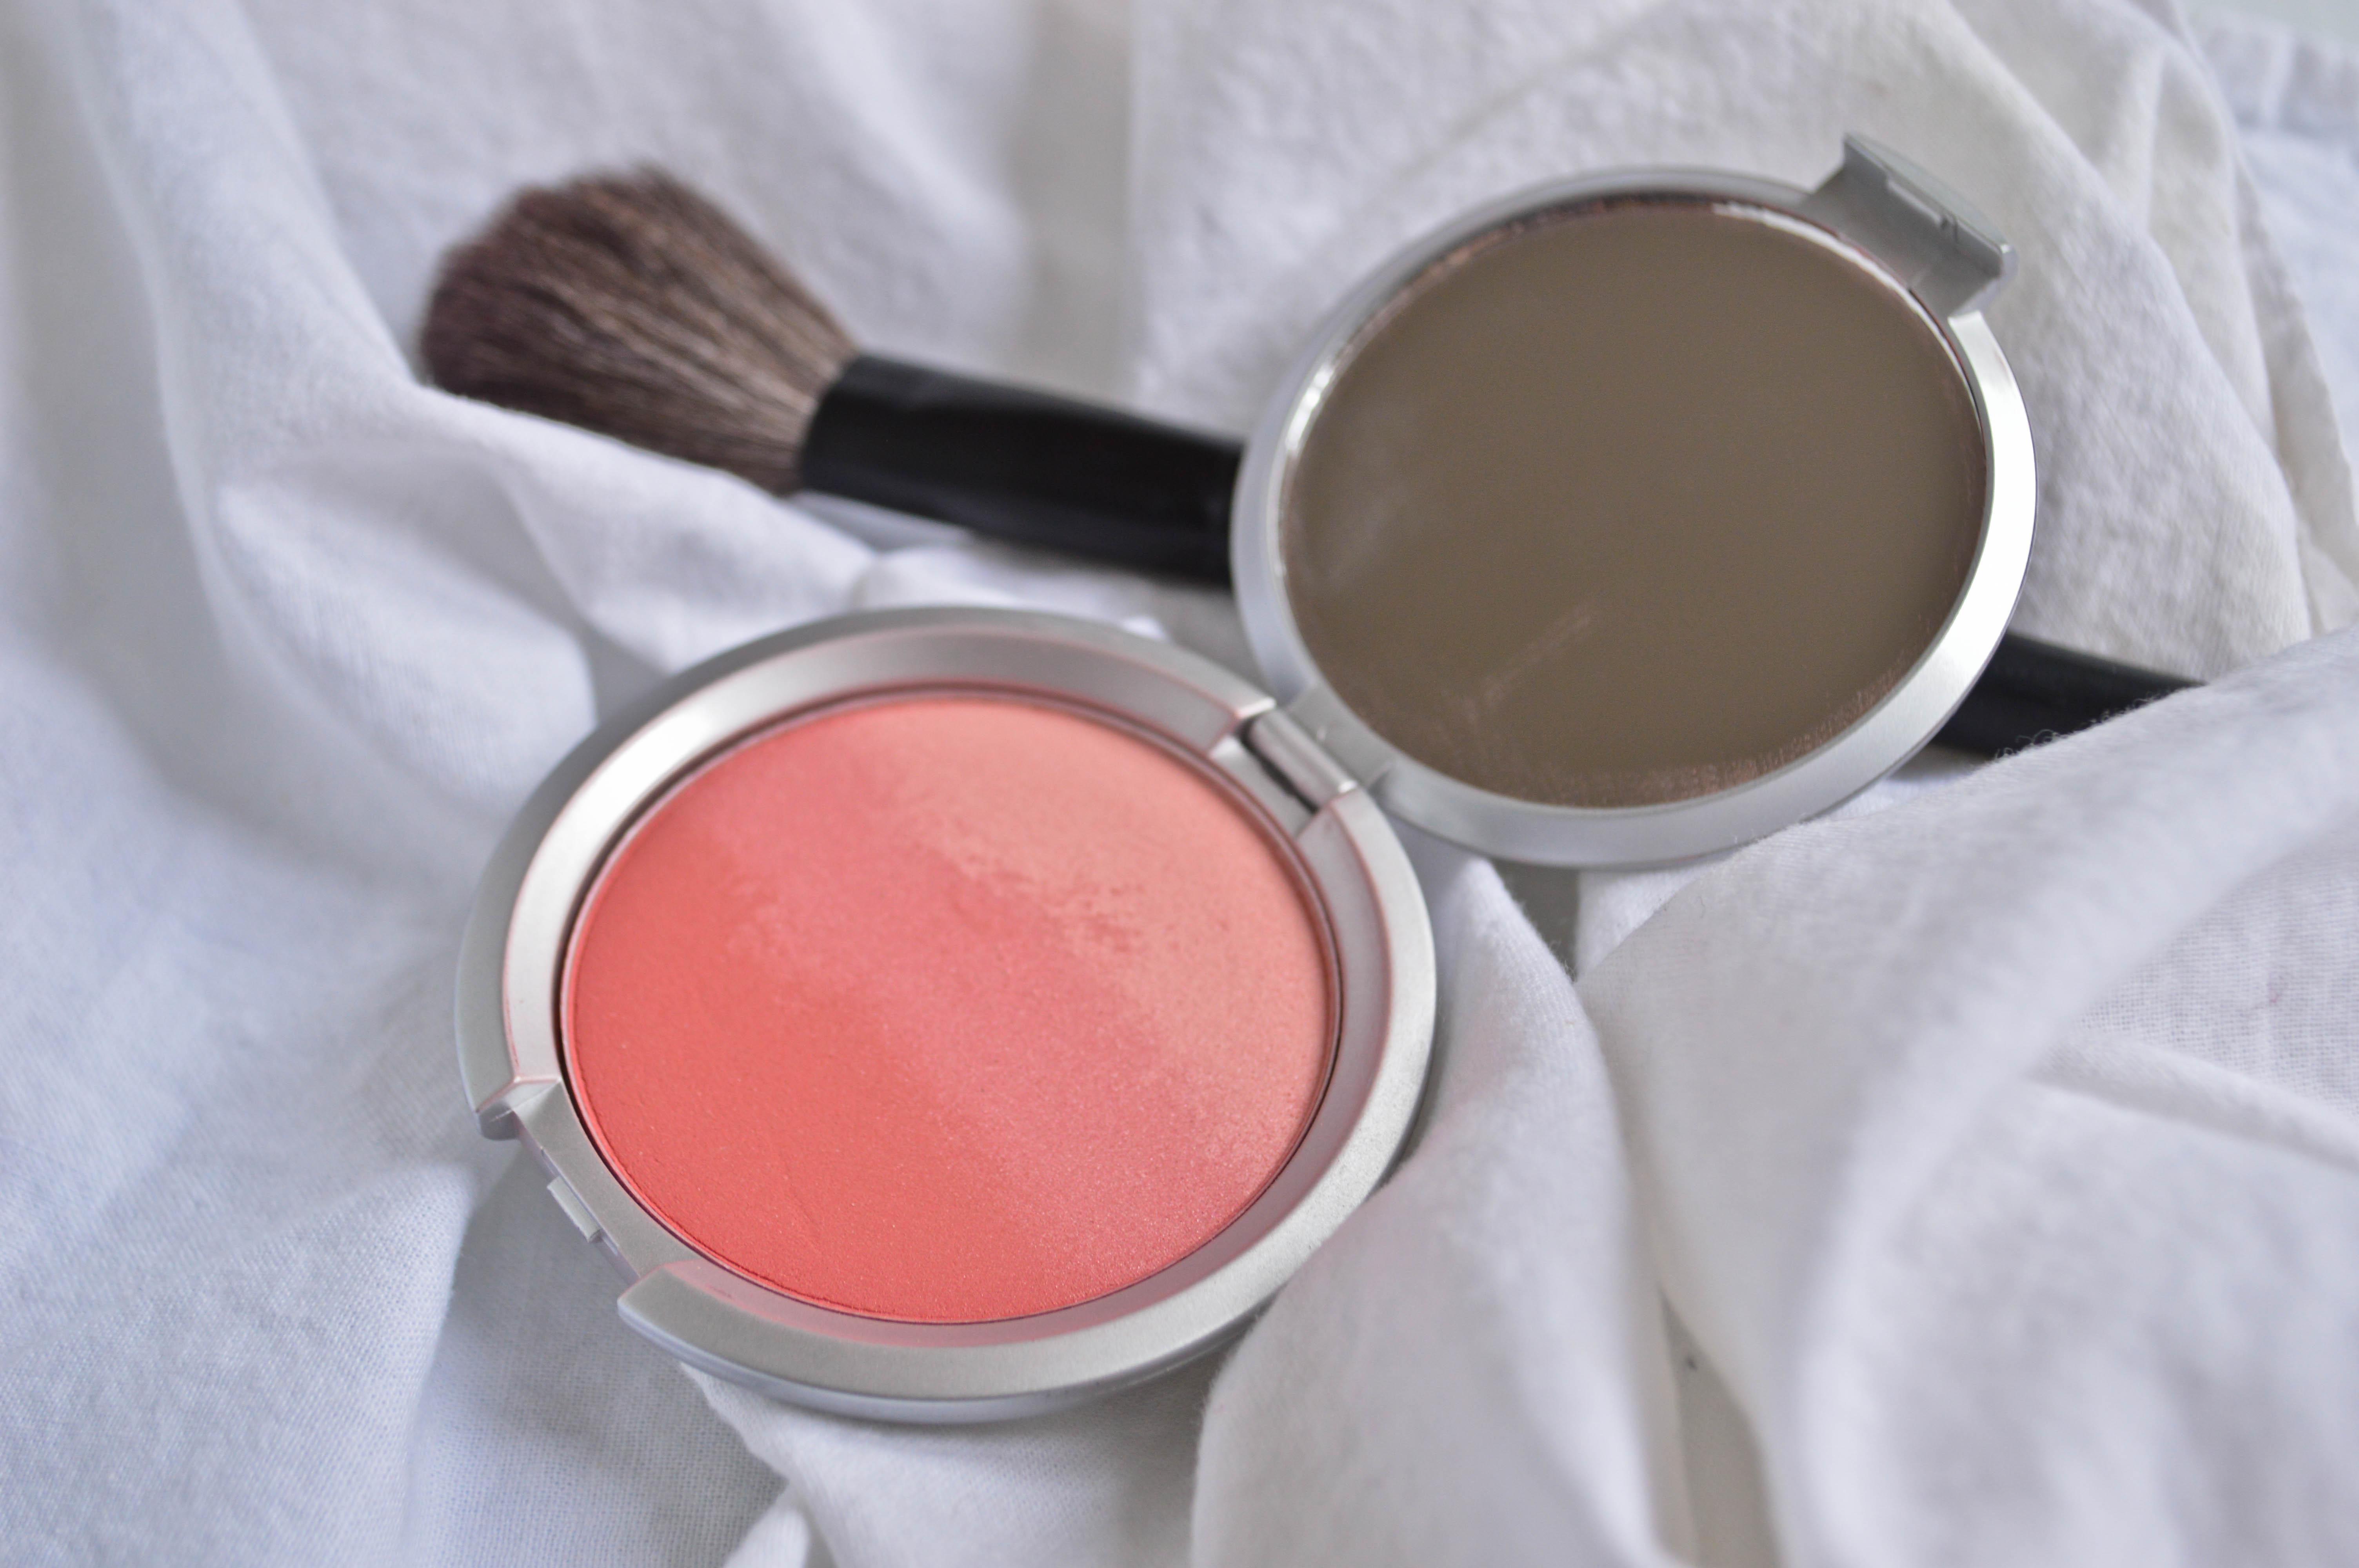 Rave: IT Cosmetics CC+ Radience Ombre Blush